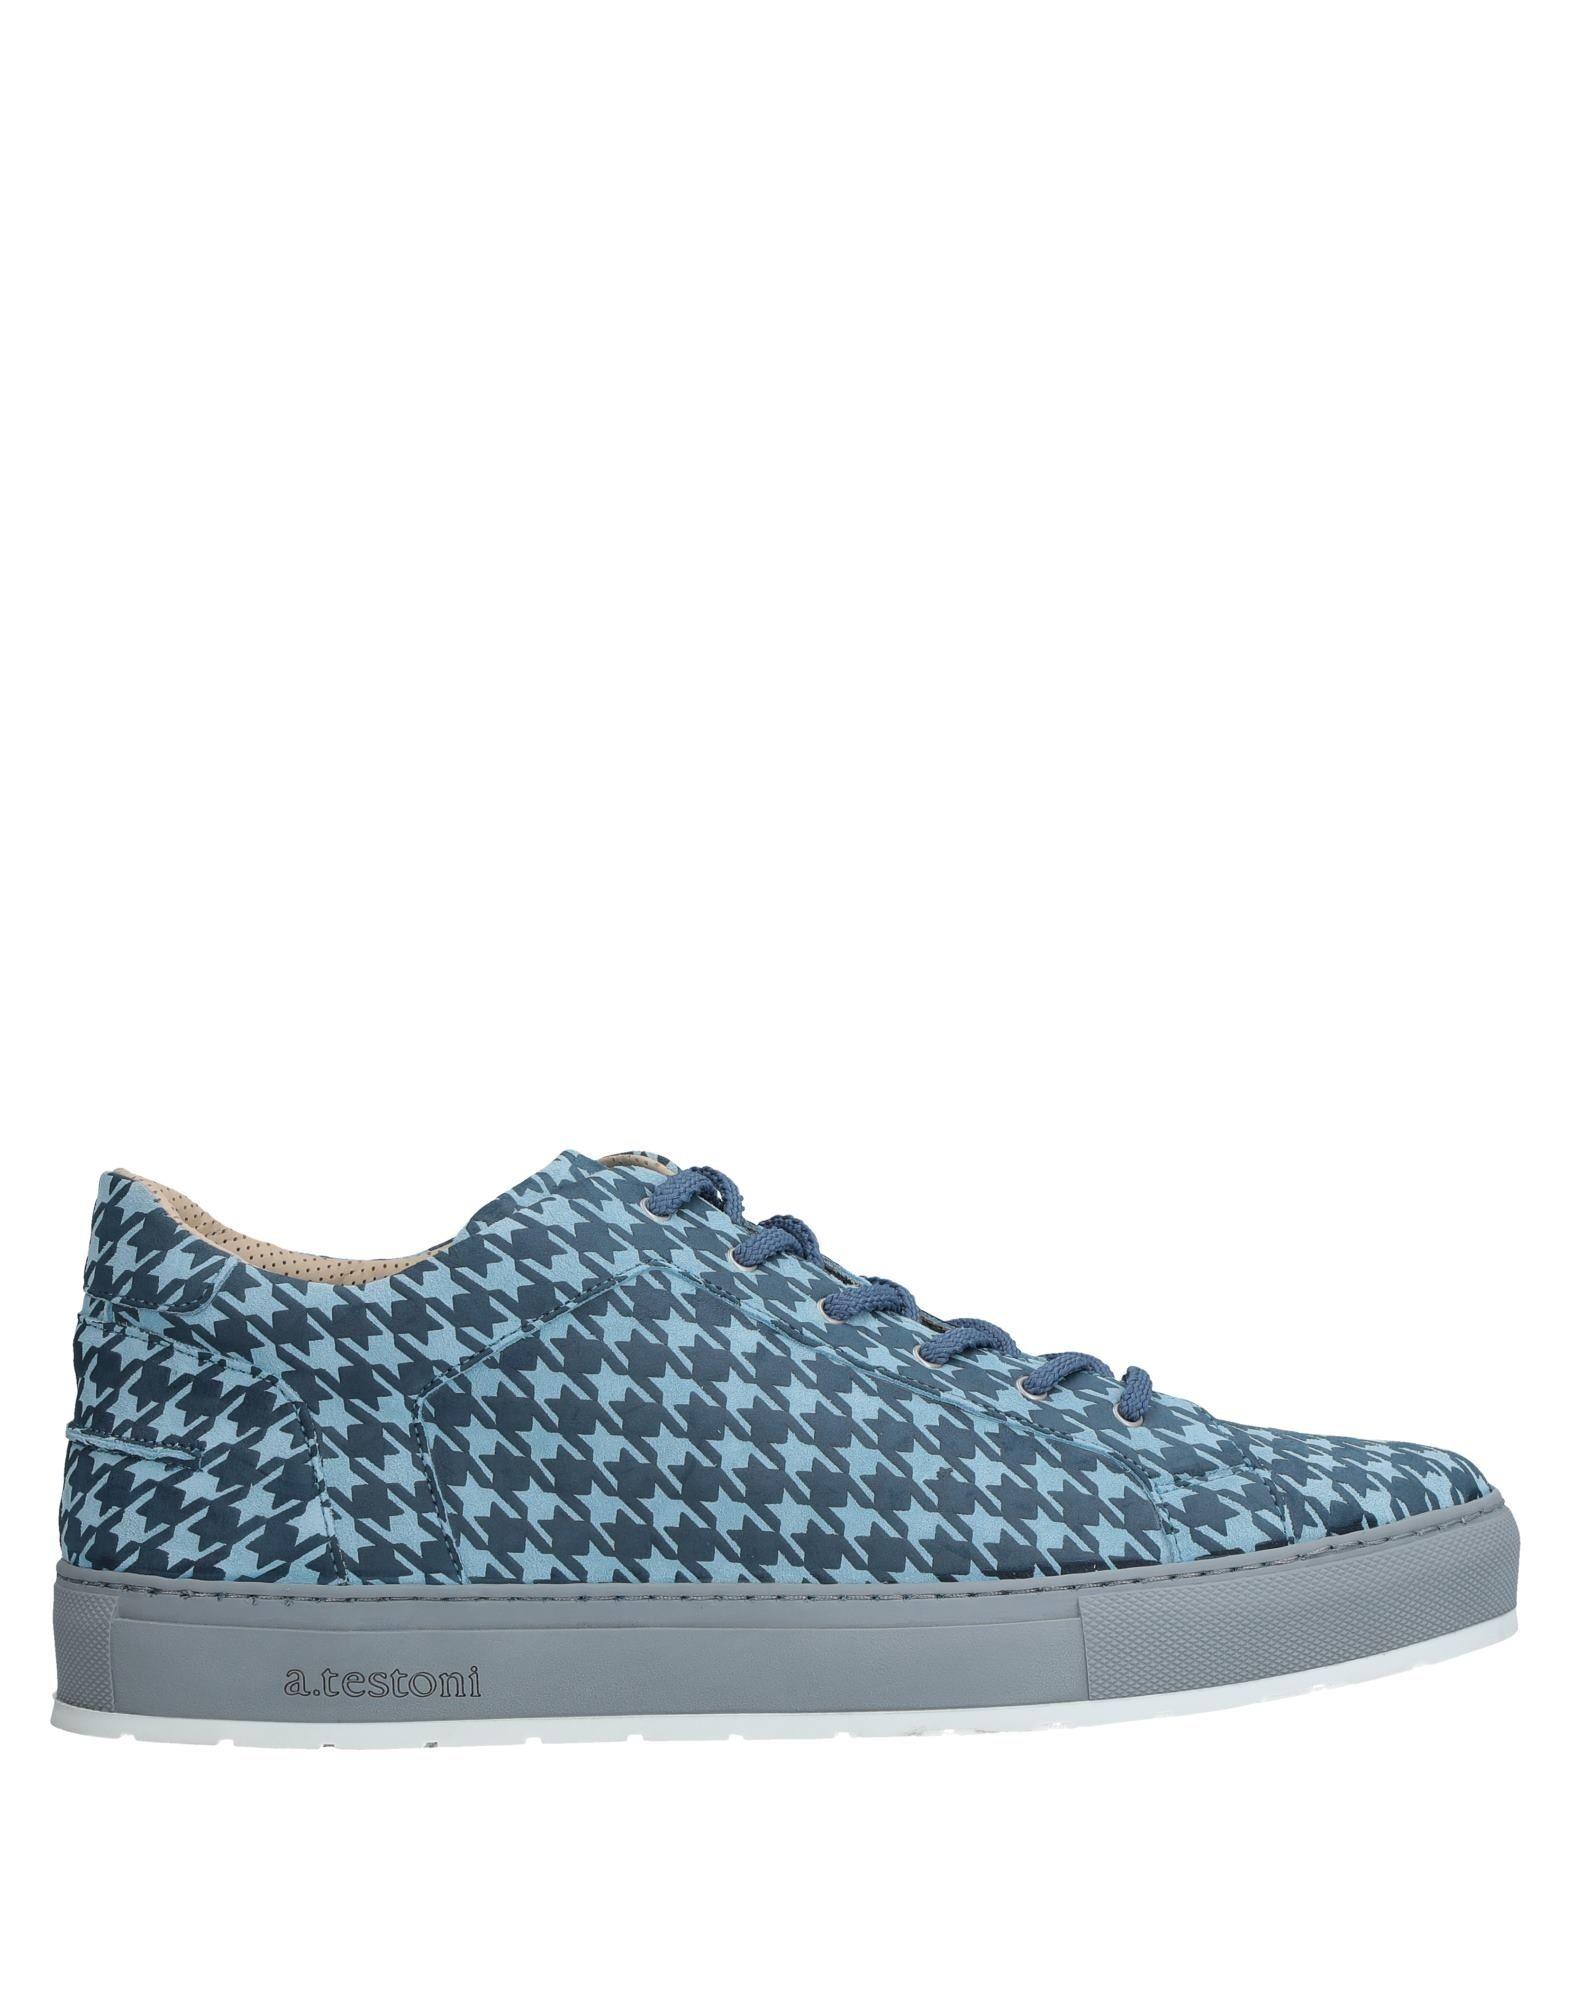 A.Testoni Sneakers Herren  11543100UA Gute Qualität beliebte Schuhe